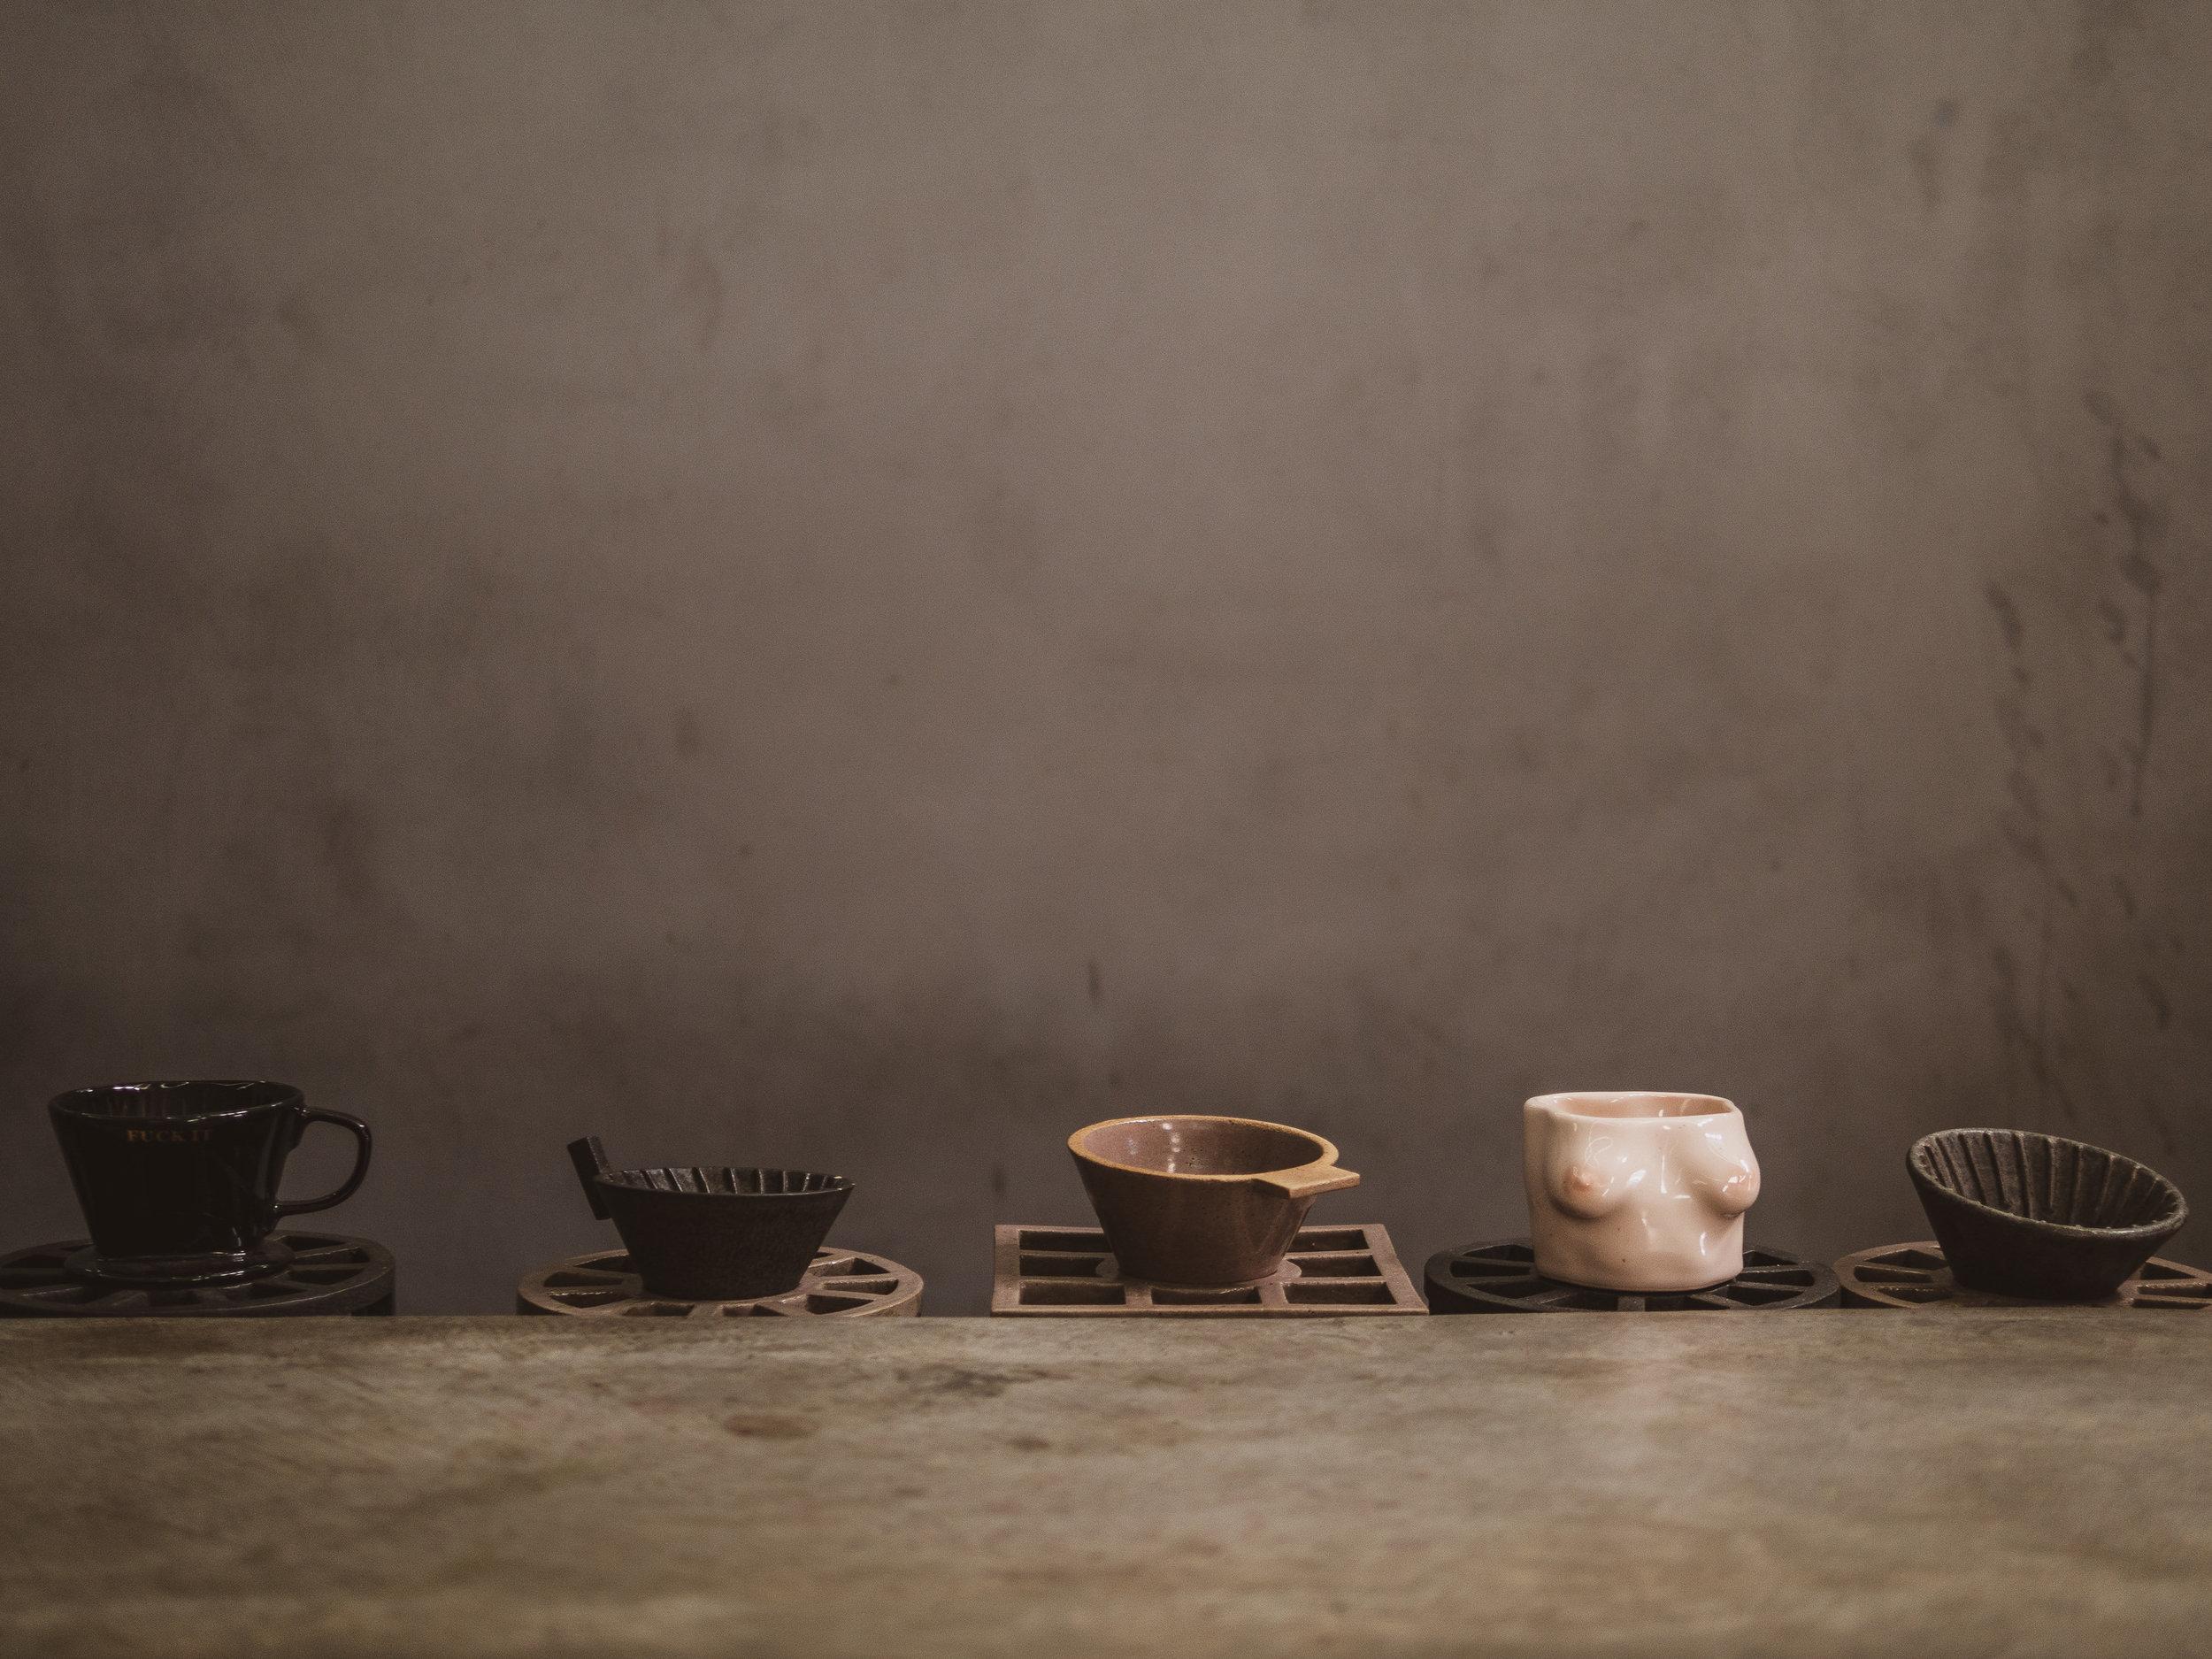 MYBELONGING-GIORGI-PORGI-COFFEE-HOUSE-DOWNTOWN-LA-PHOTOGRAPHY19.jpg